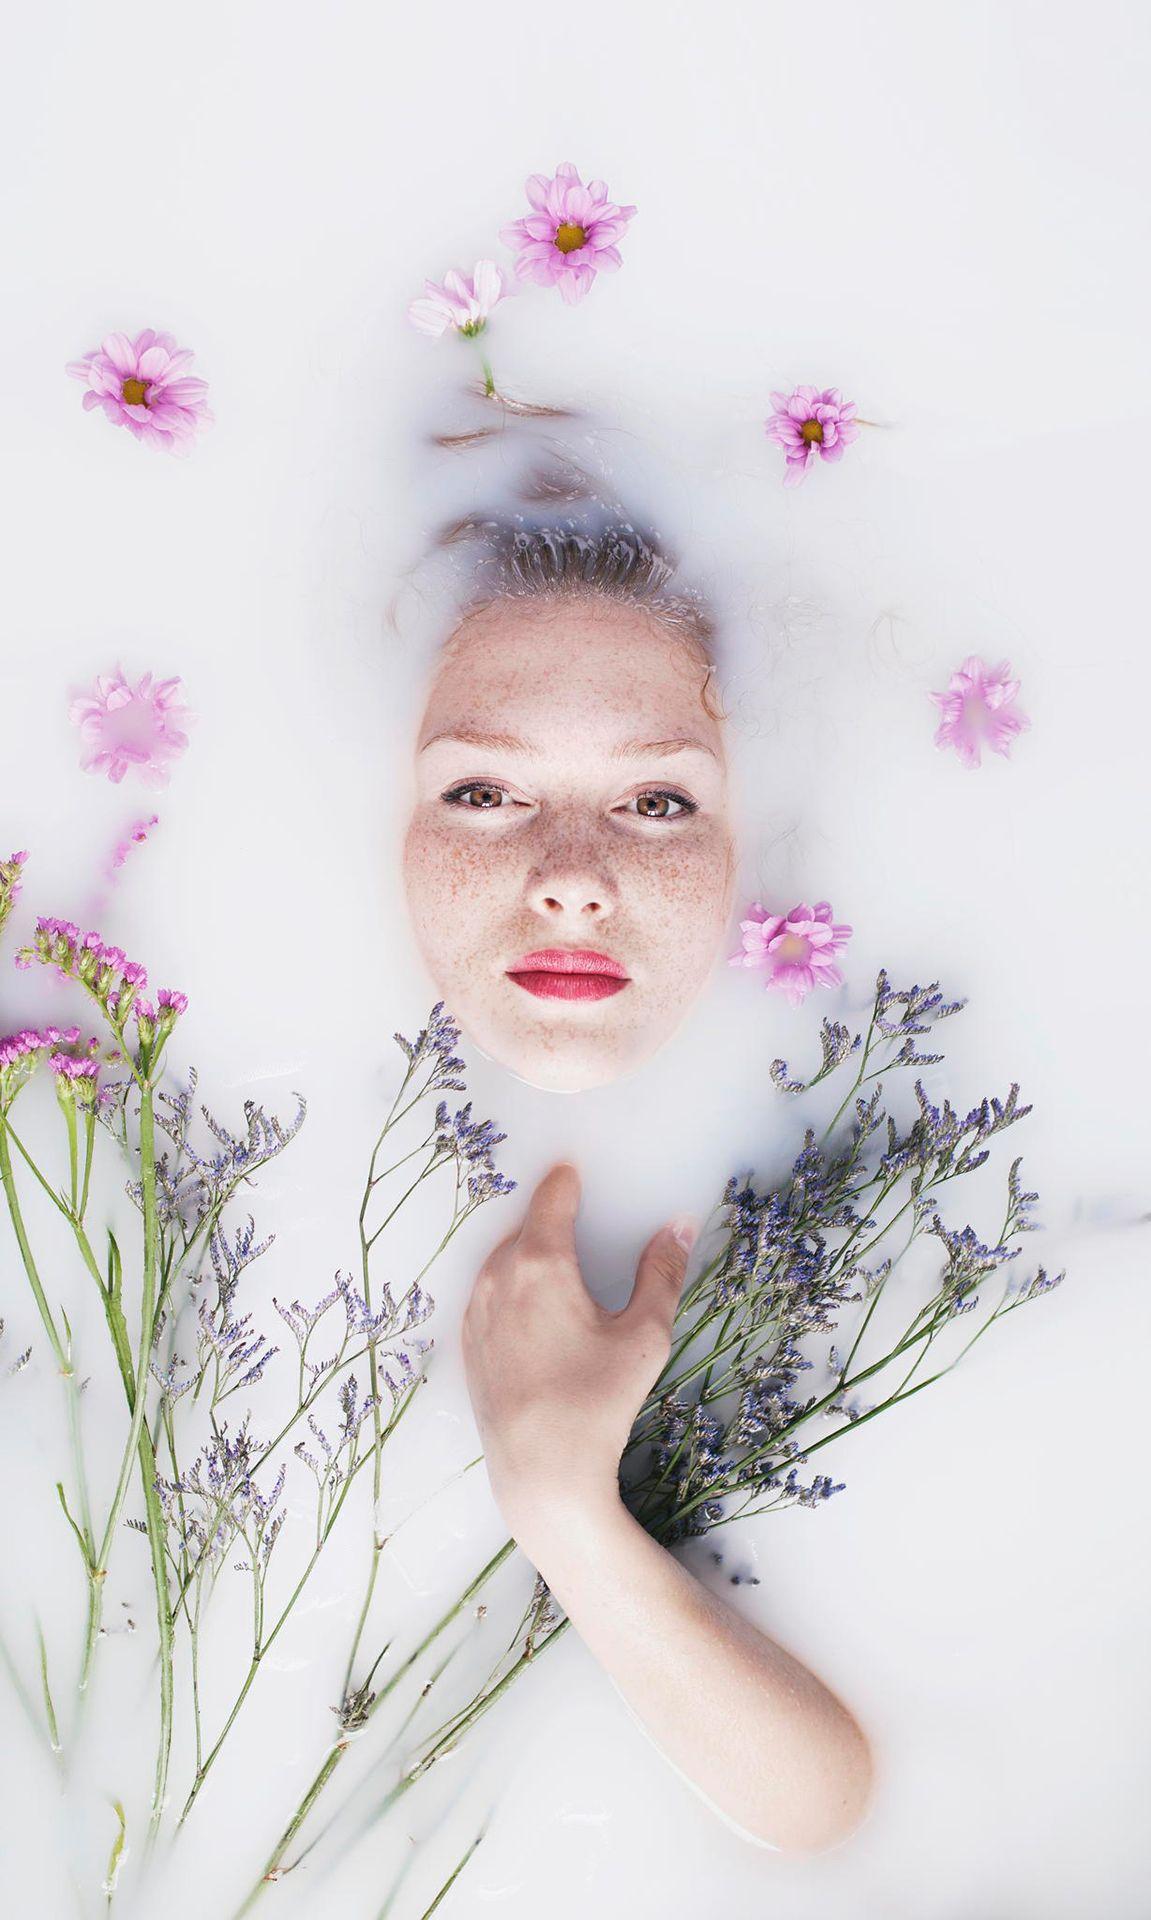 Bathtub Photoshoot Ideas Photo Shoot